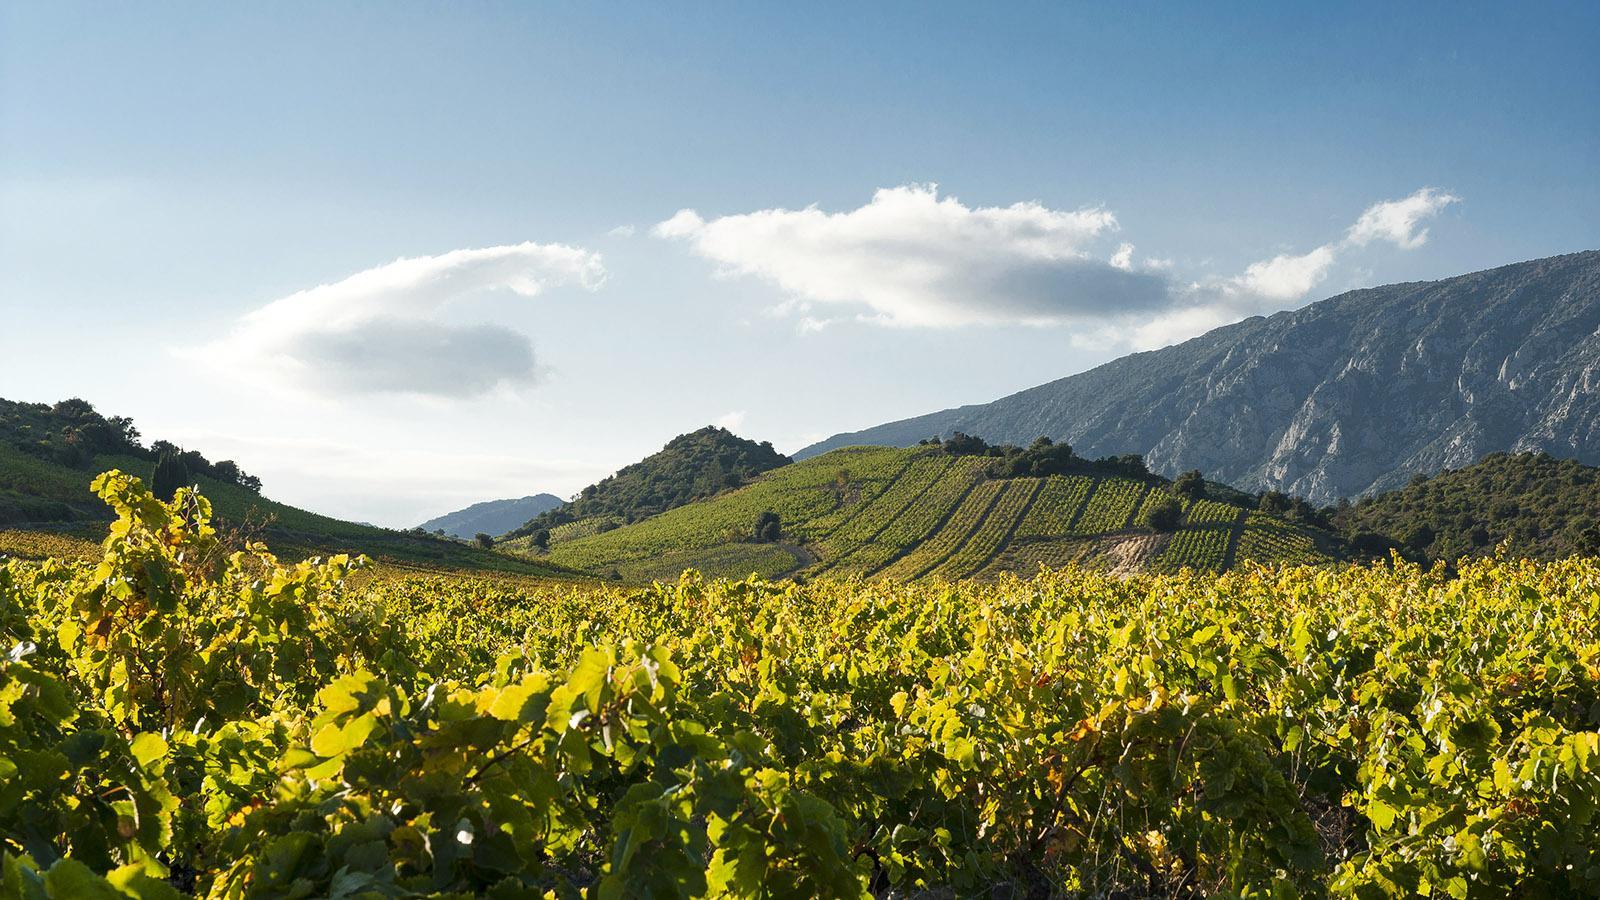 Herbst in den Weingärten des Agly-Tales bei Estagel. Foto: Hilke Maunder